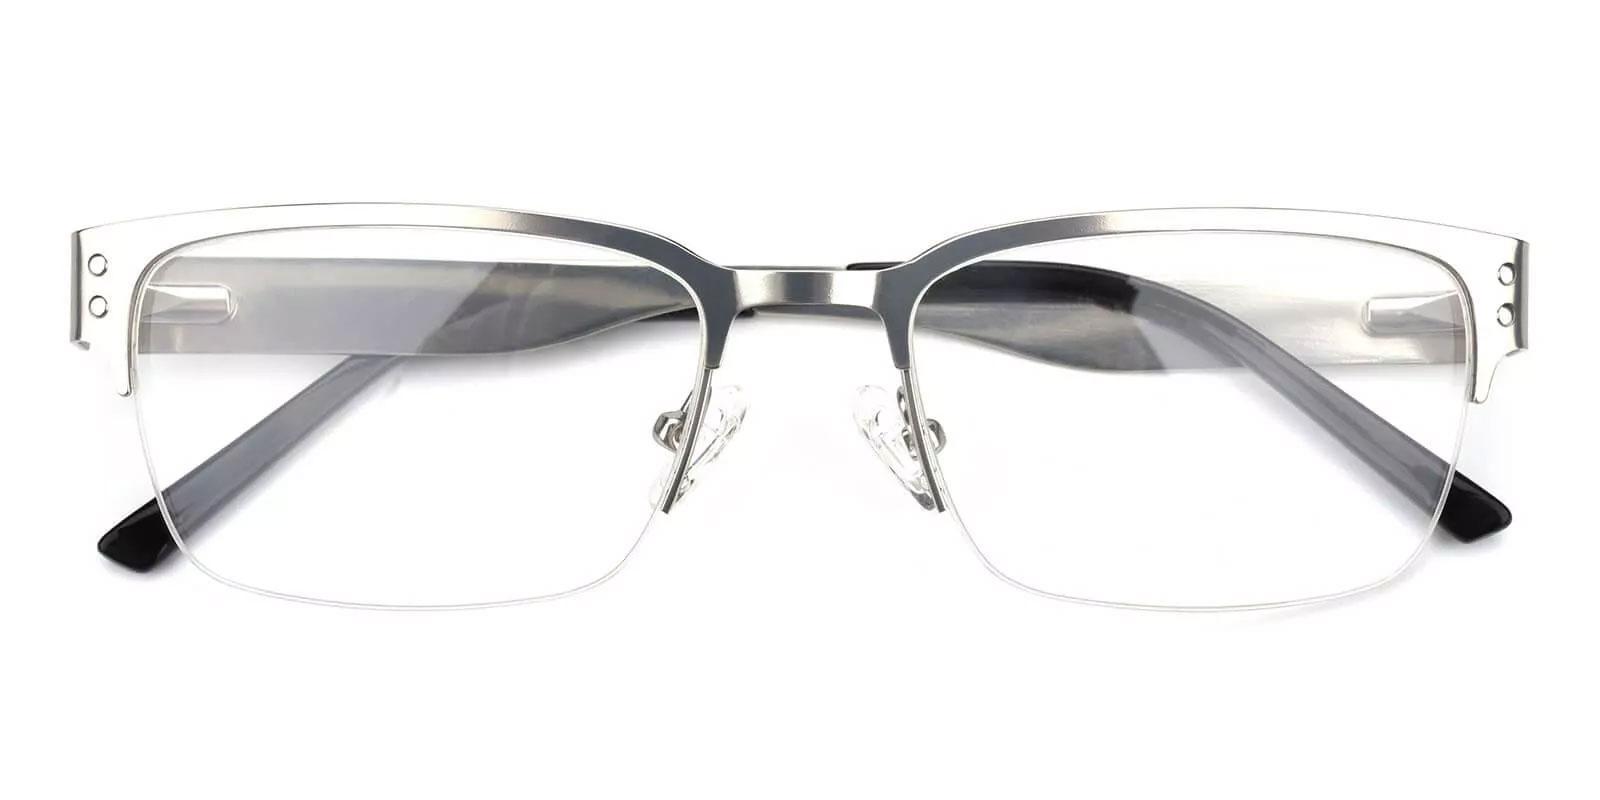 Levi Silver Metal Eyeglasses , NosePads Frames from ABBE Glasses